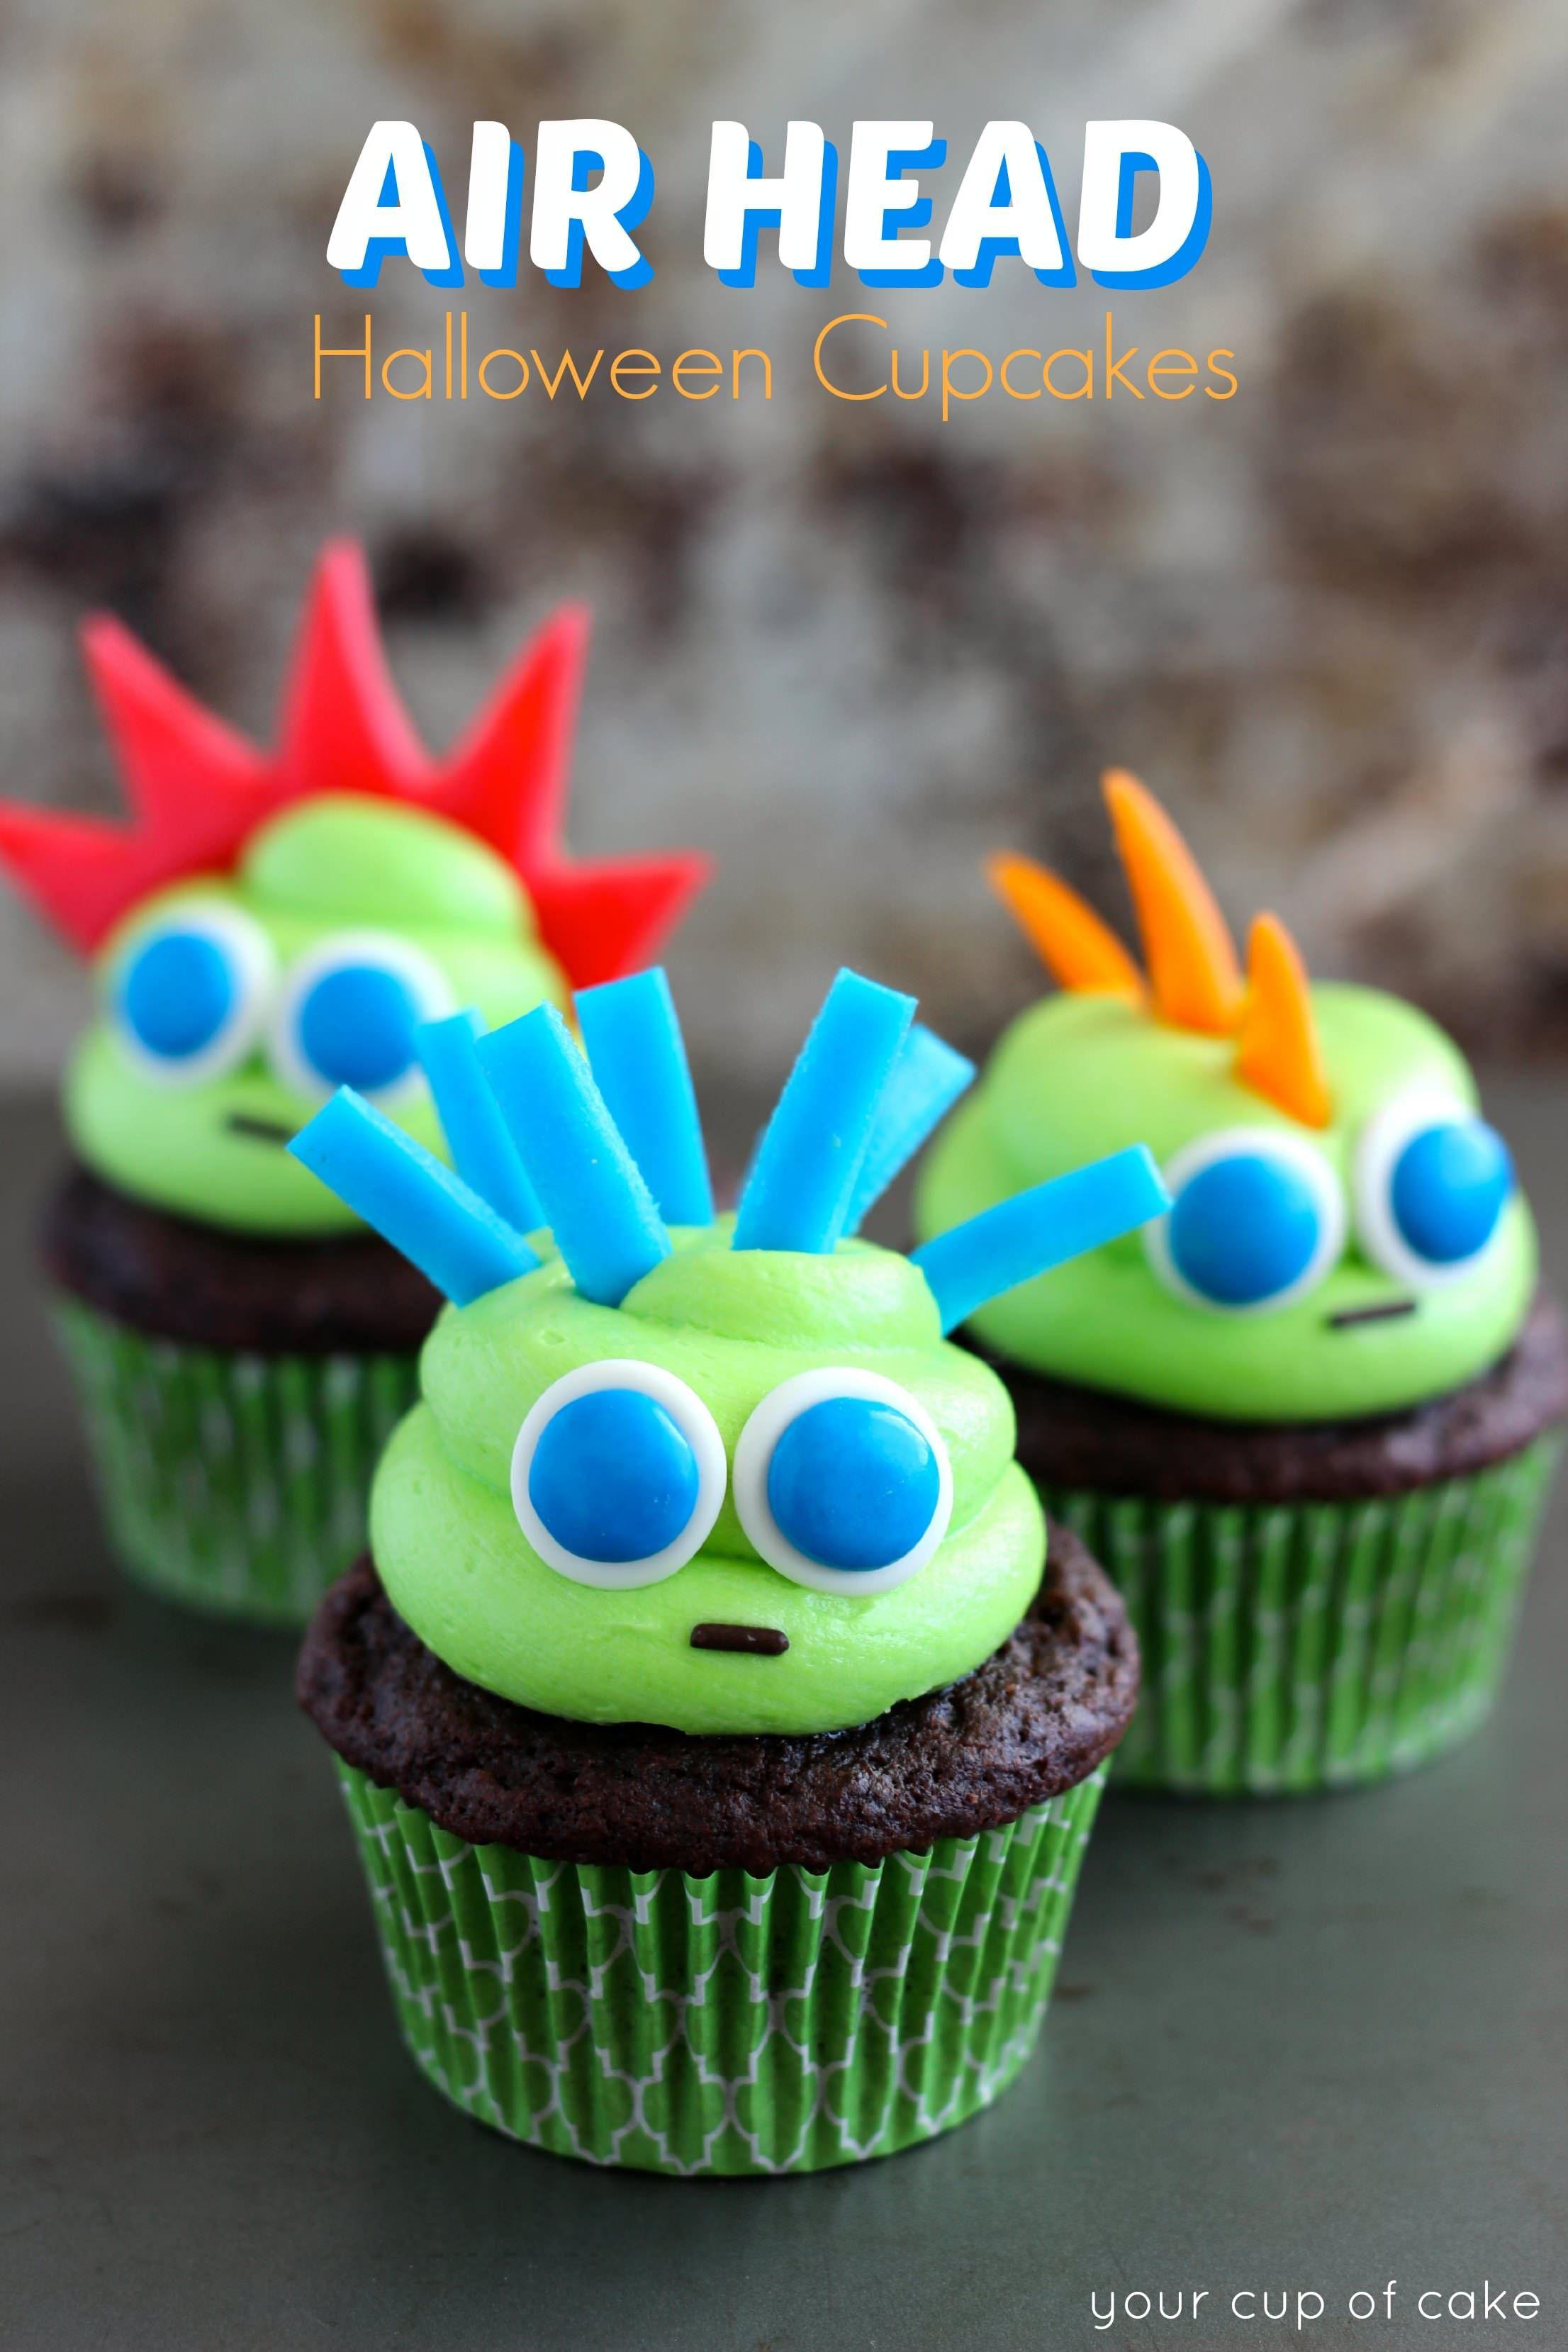 Uncategorized Easy Halloween Cake Decorating Ideas Best Easy Halloween Cake  Decorating Ideas For Inspiration And Balls